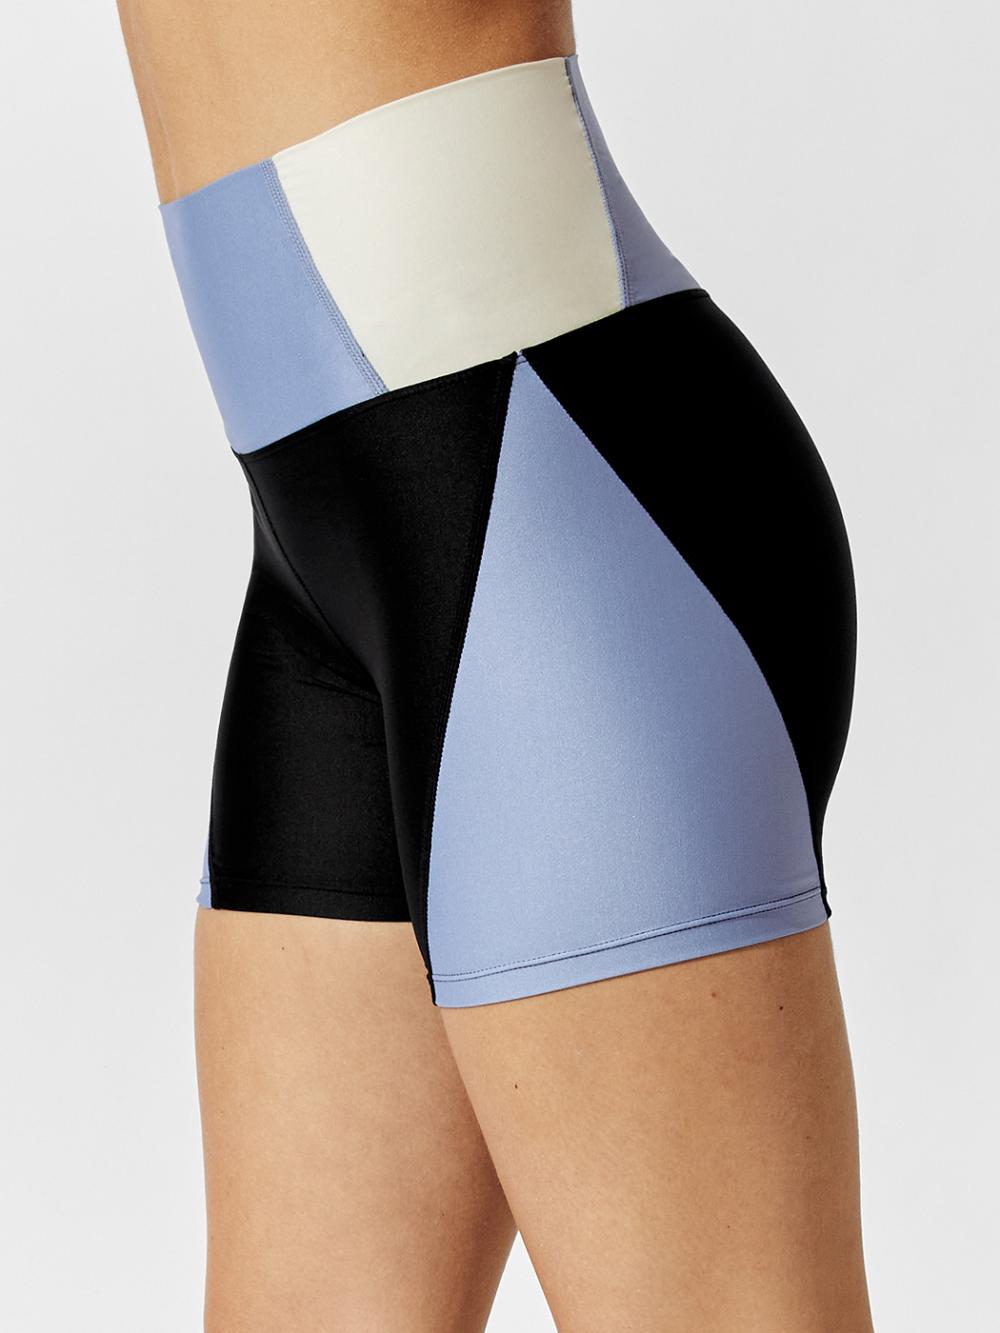 Colorblock Shortie Shorts in Indigo/ Natrual White